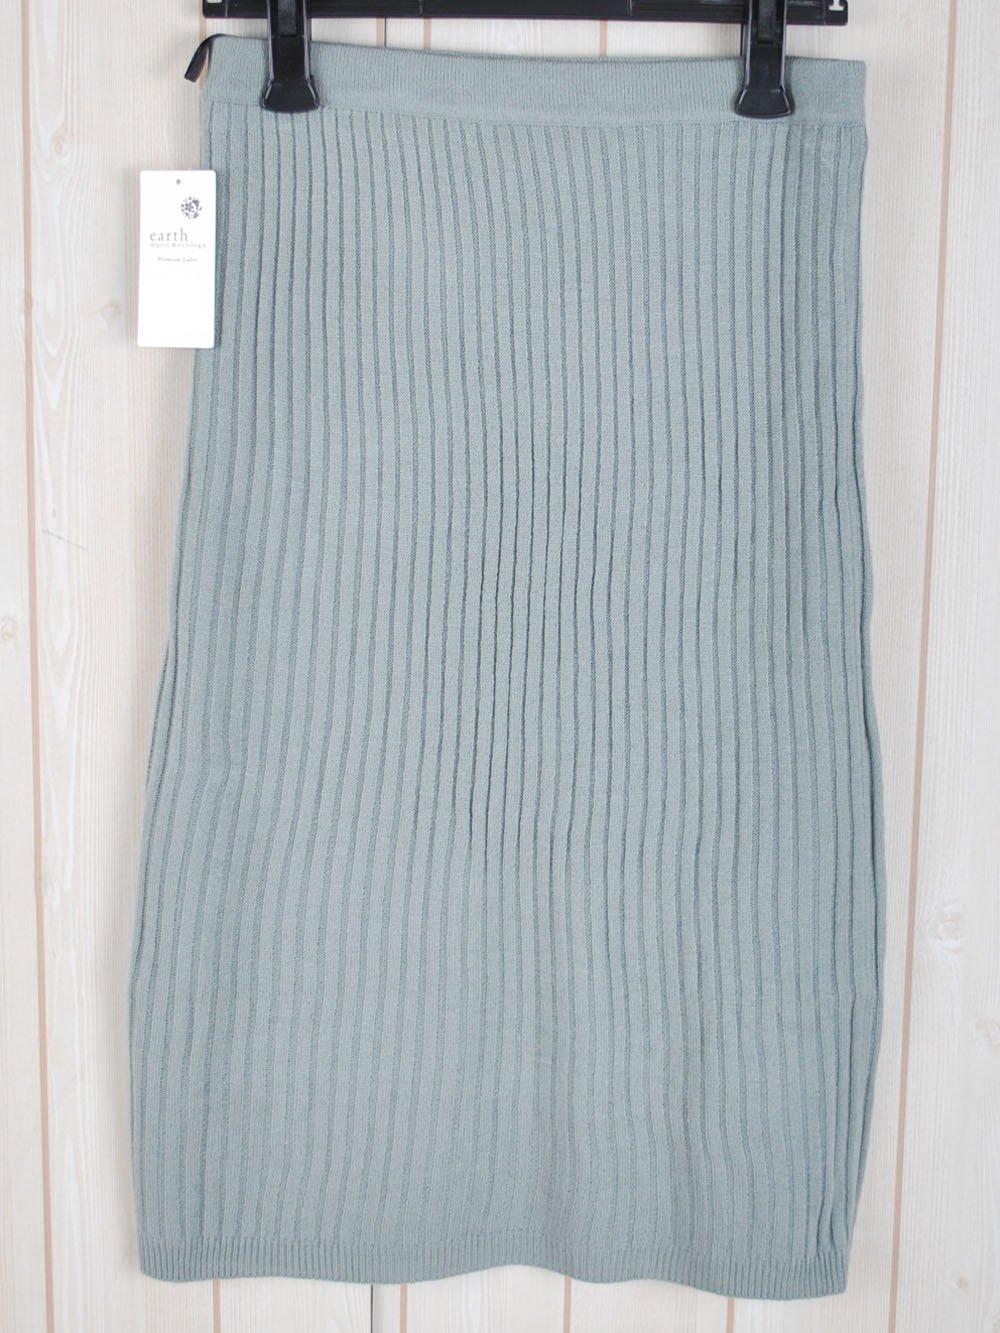 【93%OFF】@420円■5点セット■リブニットスカート